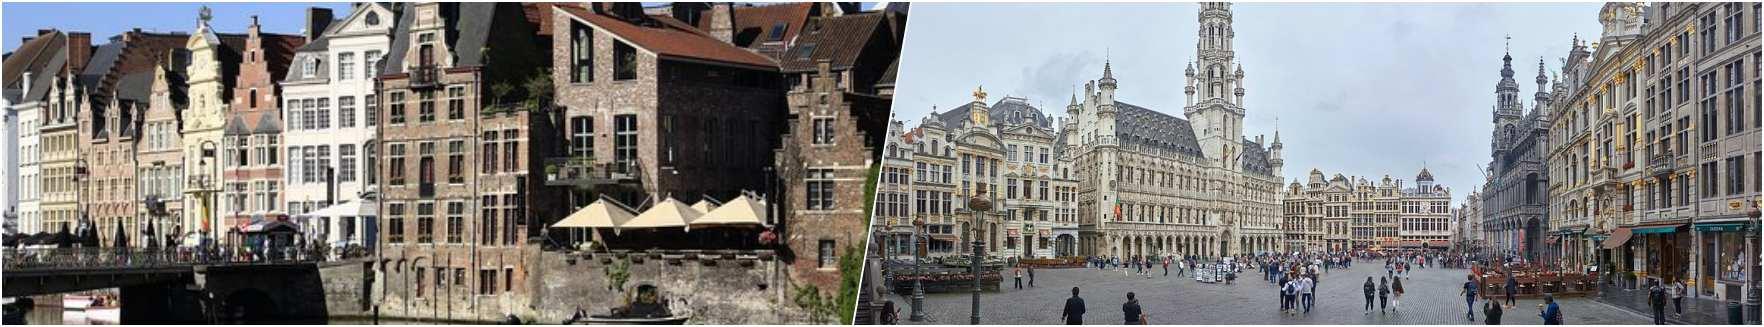 Ghent - Grande Place Brussels